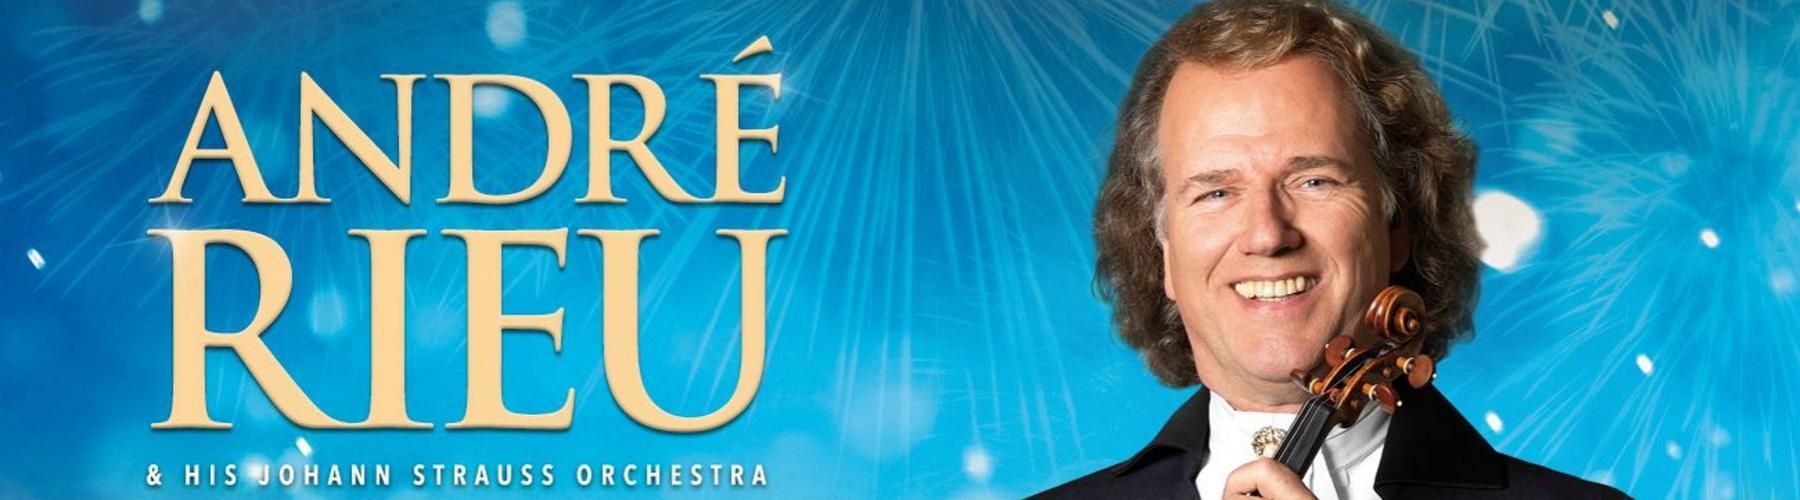 EuroTourGuide Coach Tour 9th-11th February 2022 Andre Rieu Madrid